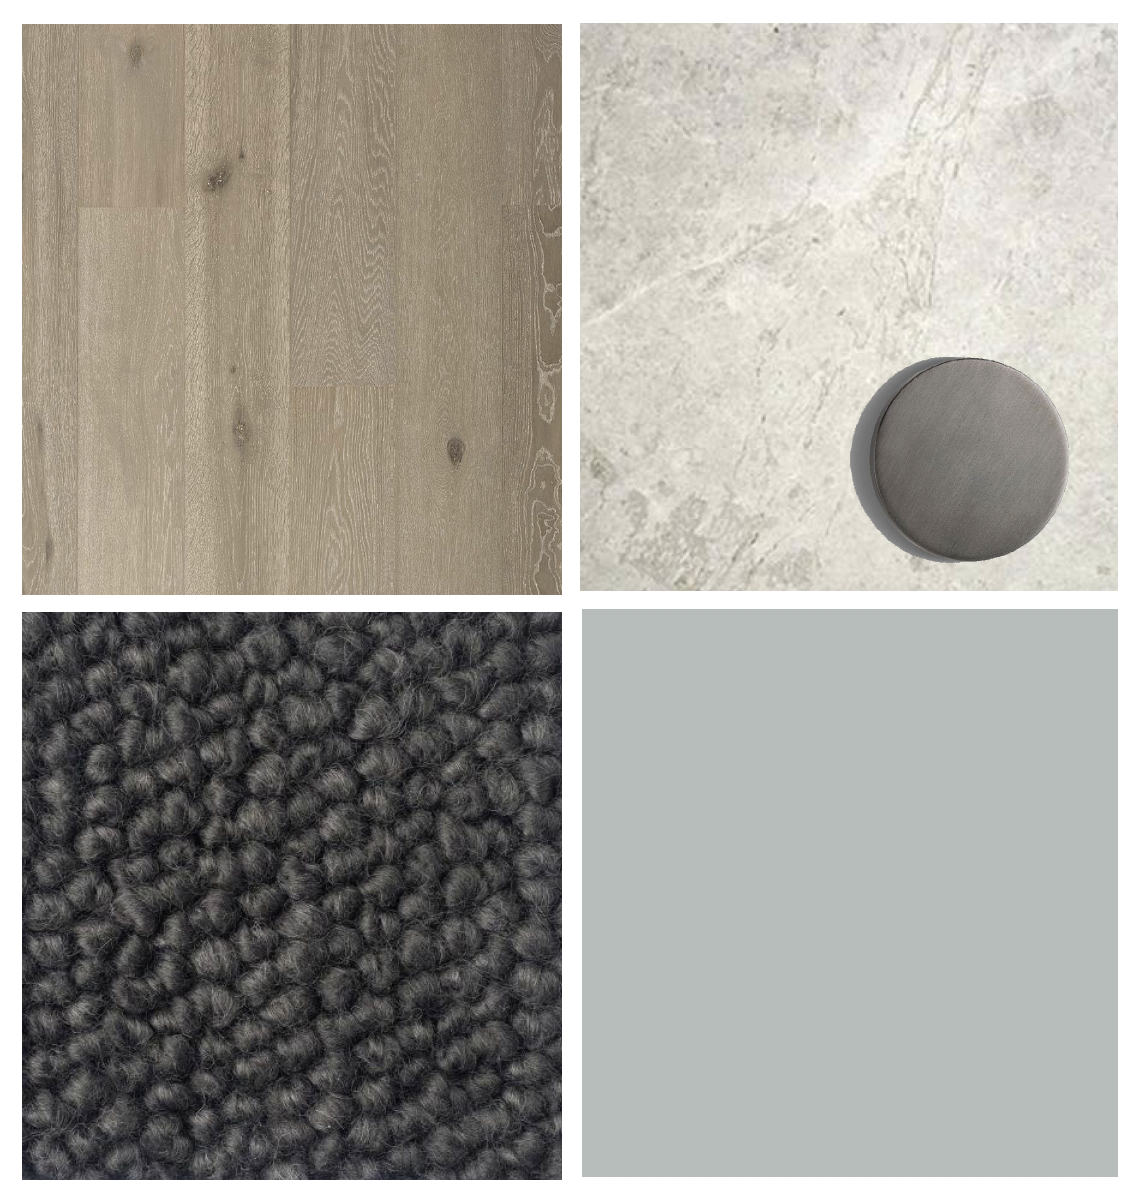 Natural benchtops, tiles & flooring, medium timber floorboards, dark joinery, dark carpet